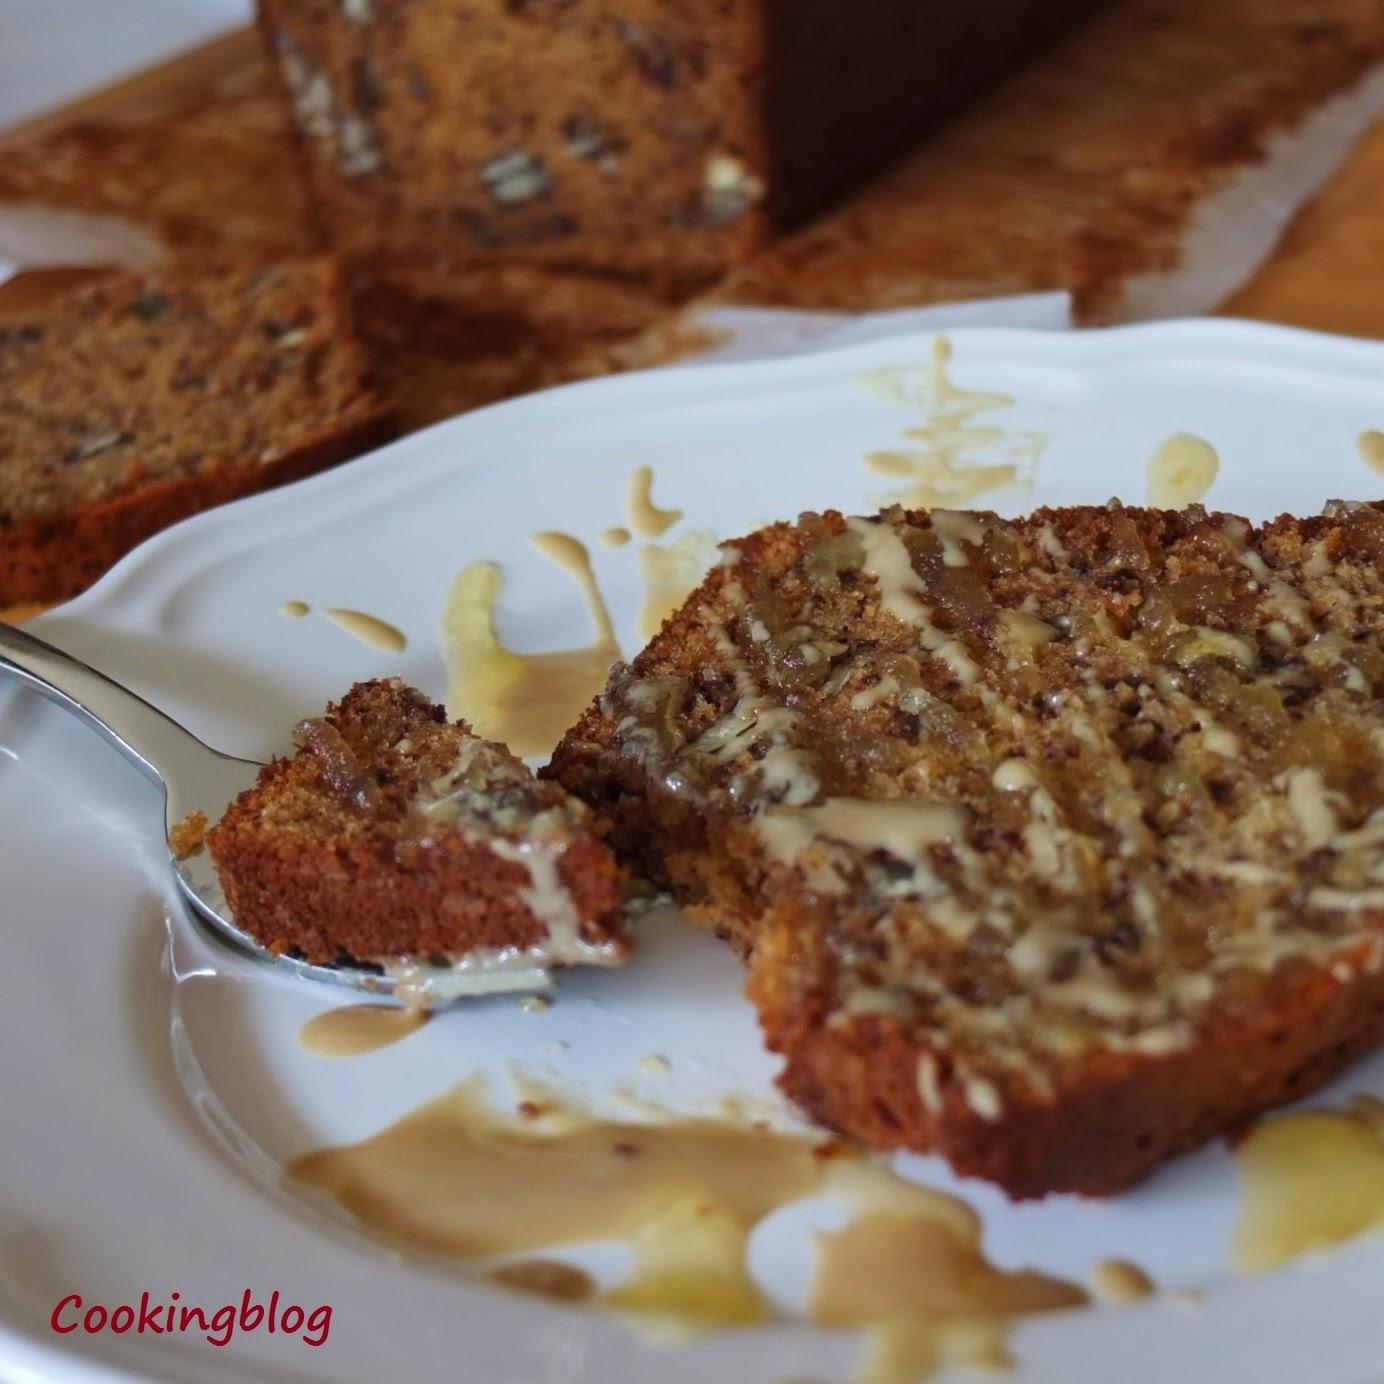 Pão de banana tostado com tahini e mel | Grilled banana bread with tahini and honey